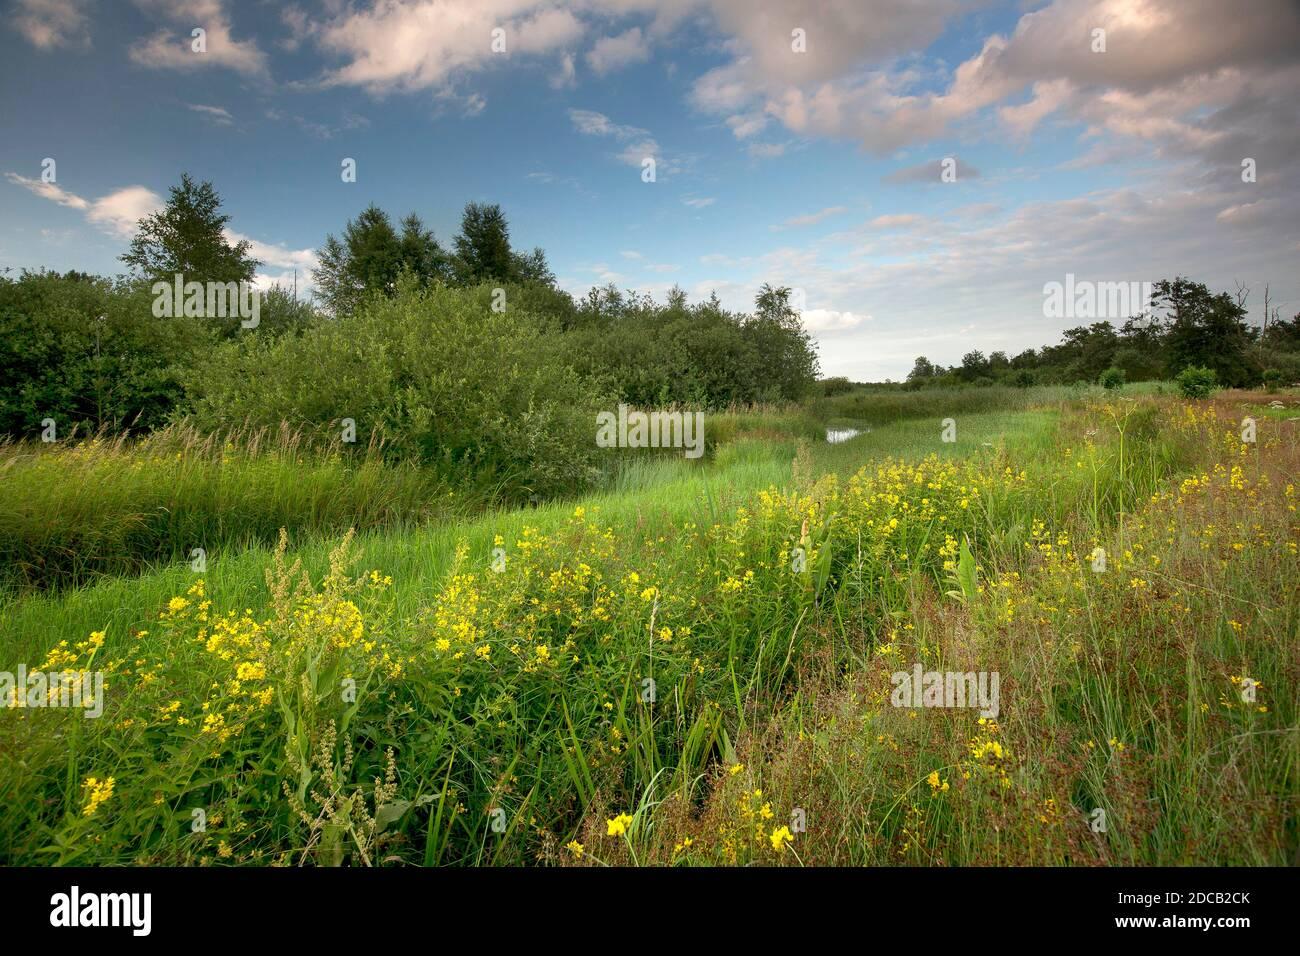 nature reserve de Zegge, Belgium, De Zegge Stock Photo